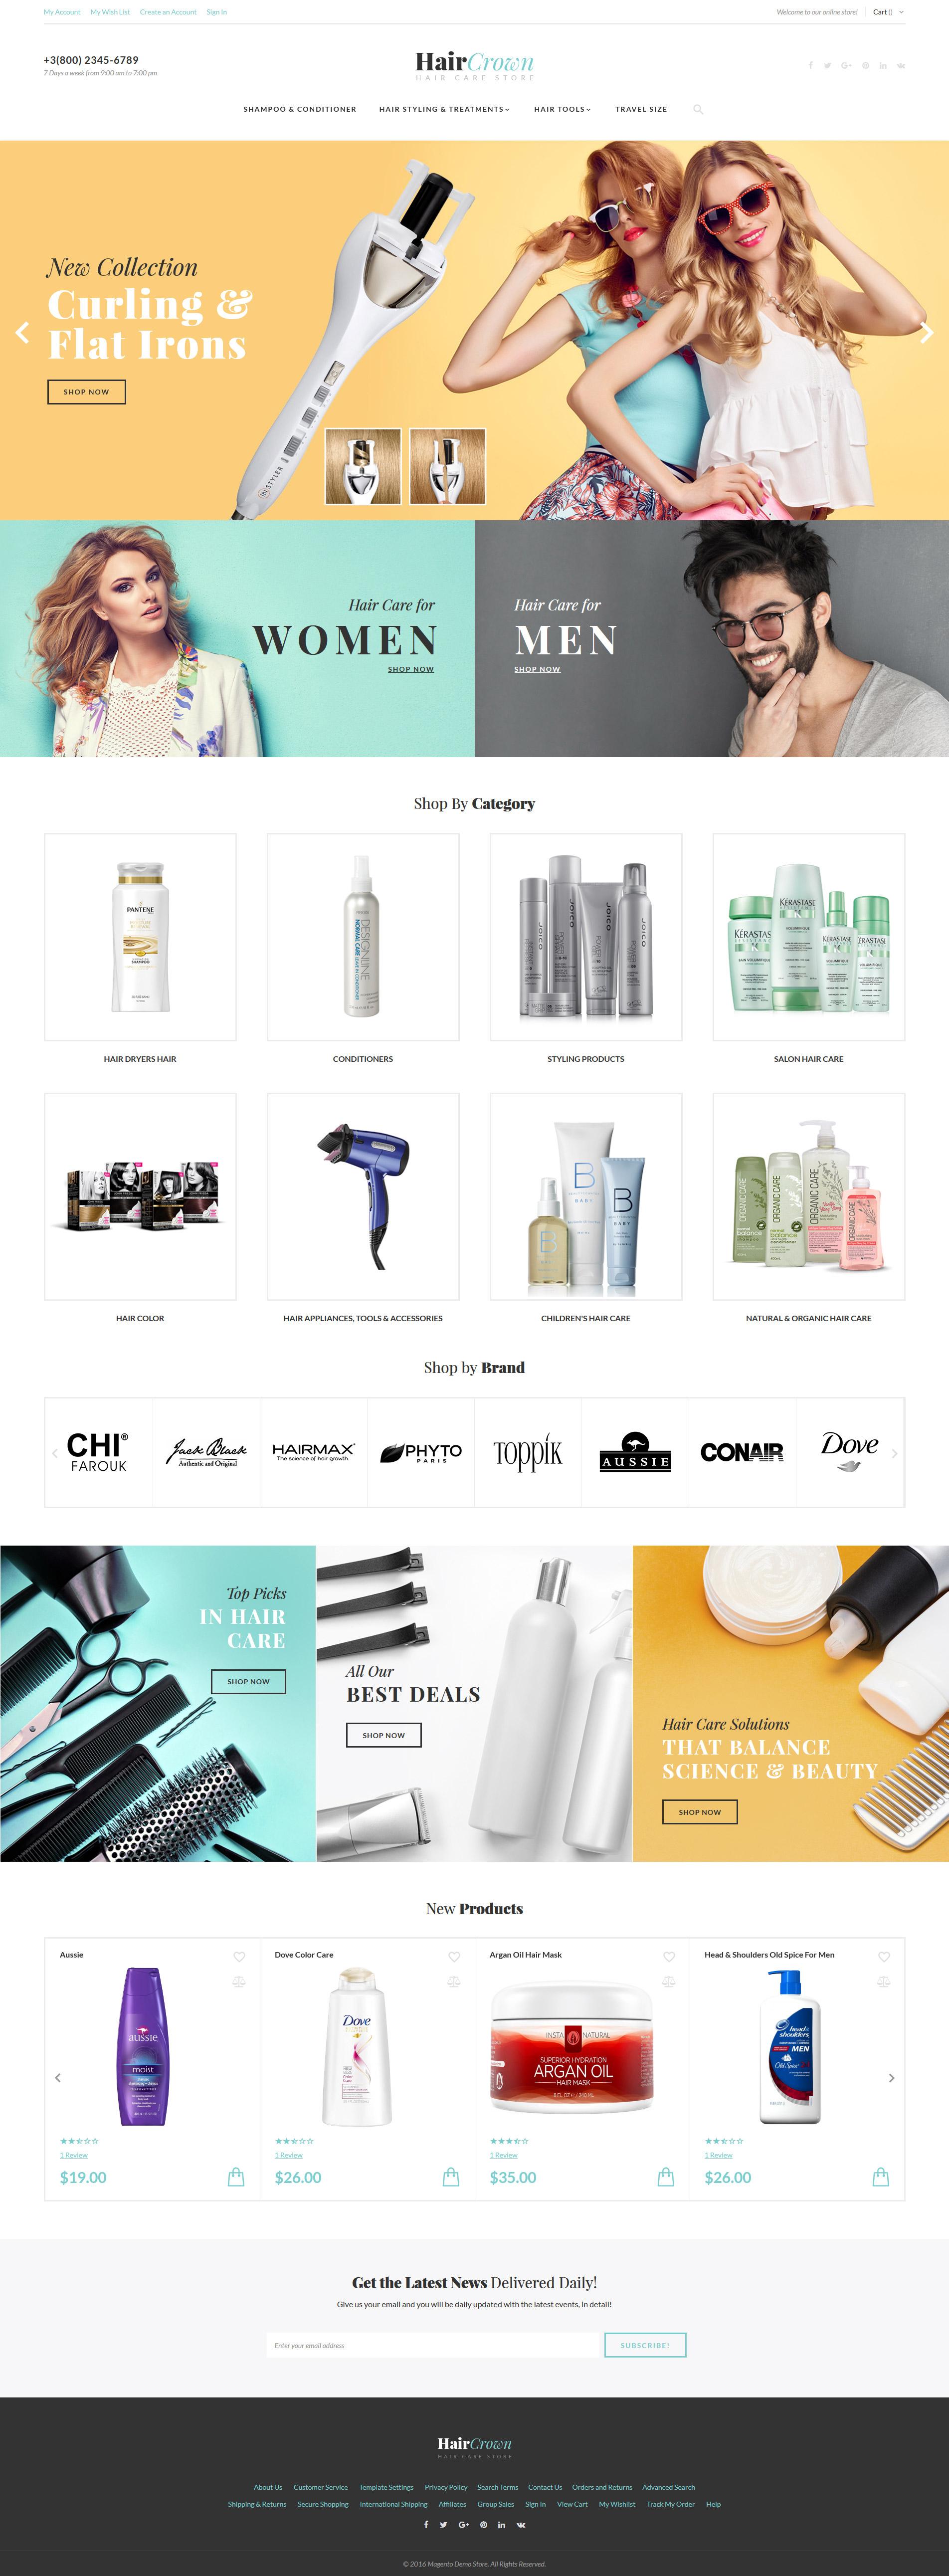 HairCrown - Hair Salon Responsive Magento Theme - screenshot